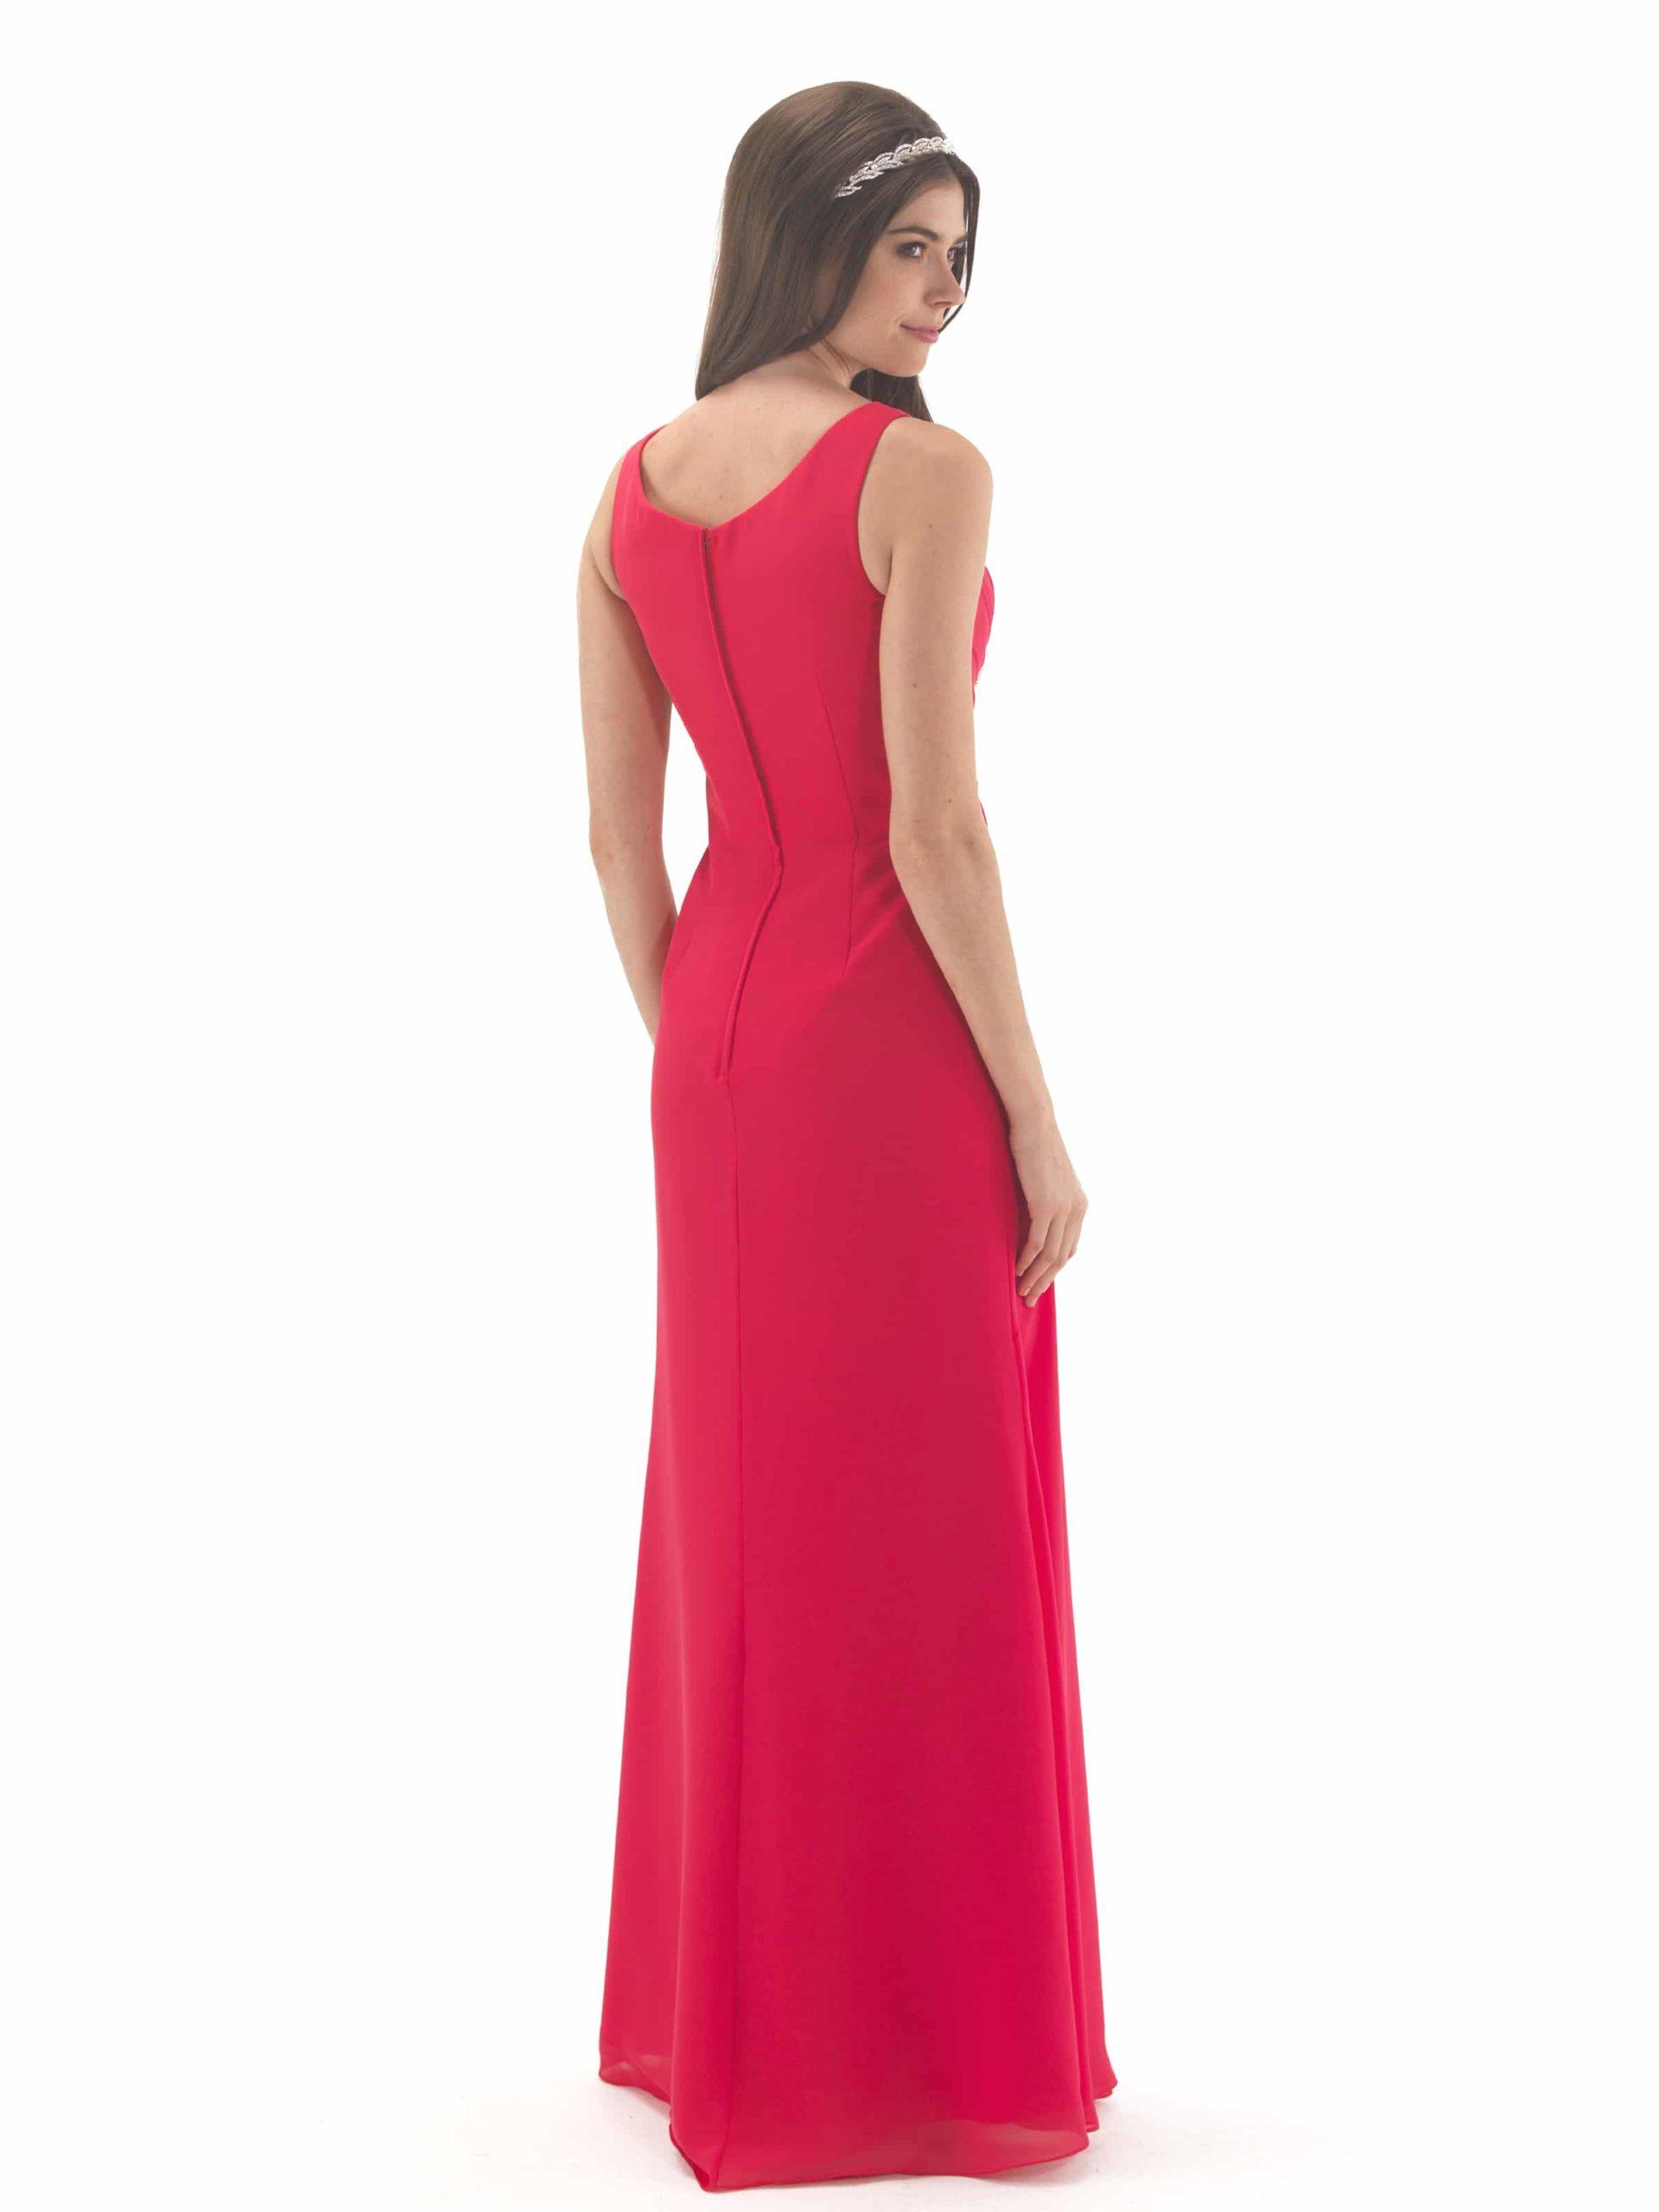 en356-bridesmaid-dress-back